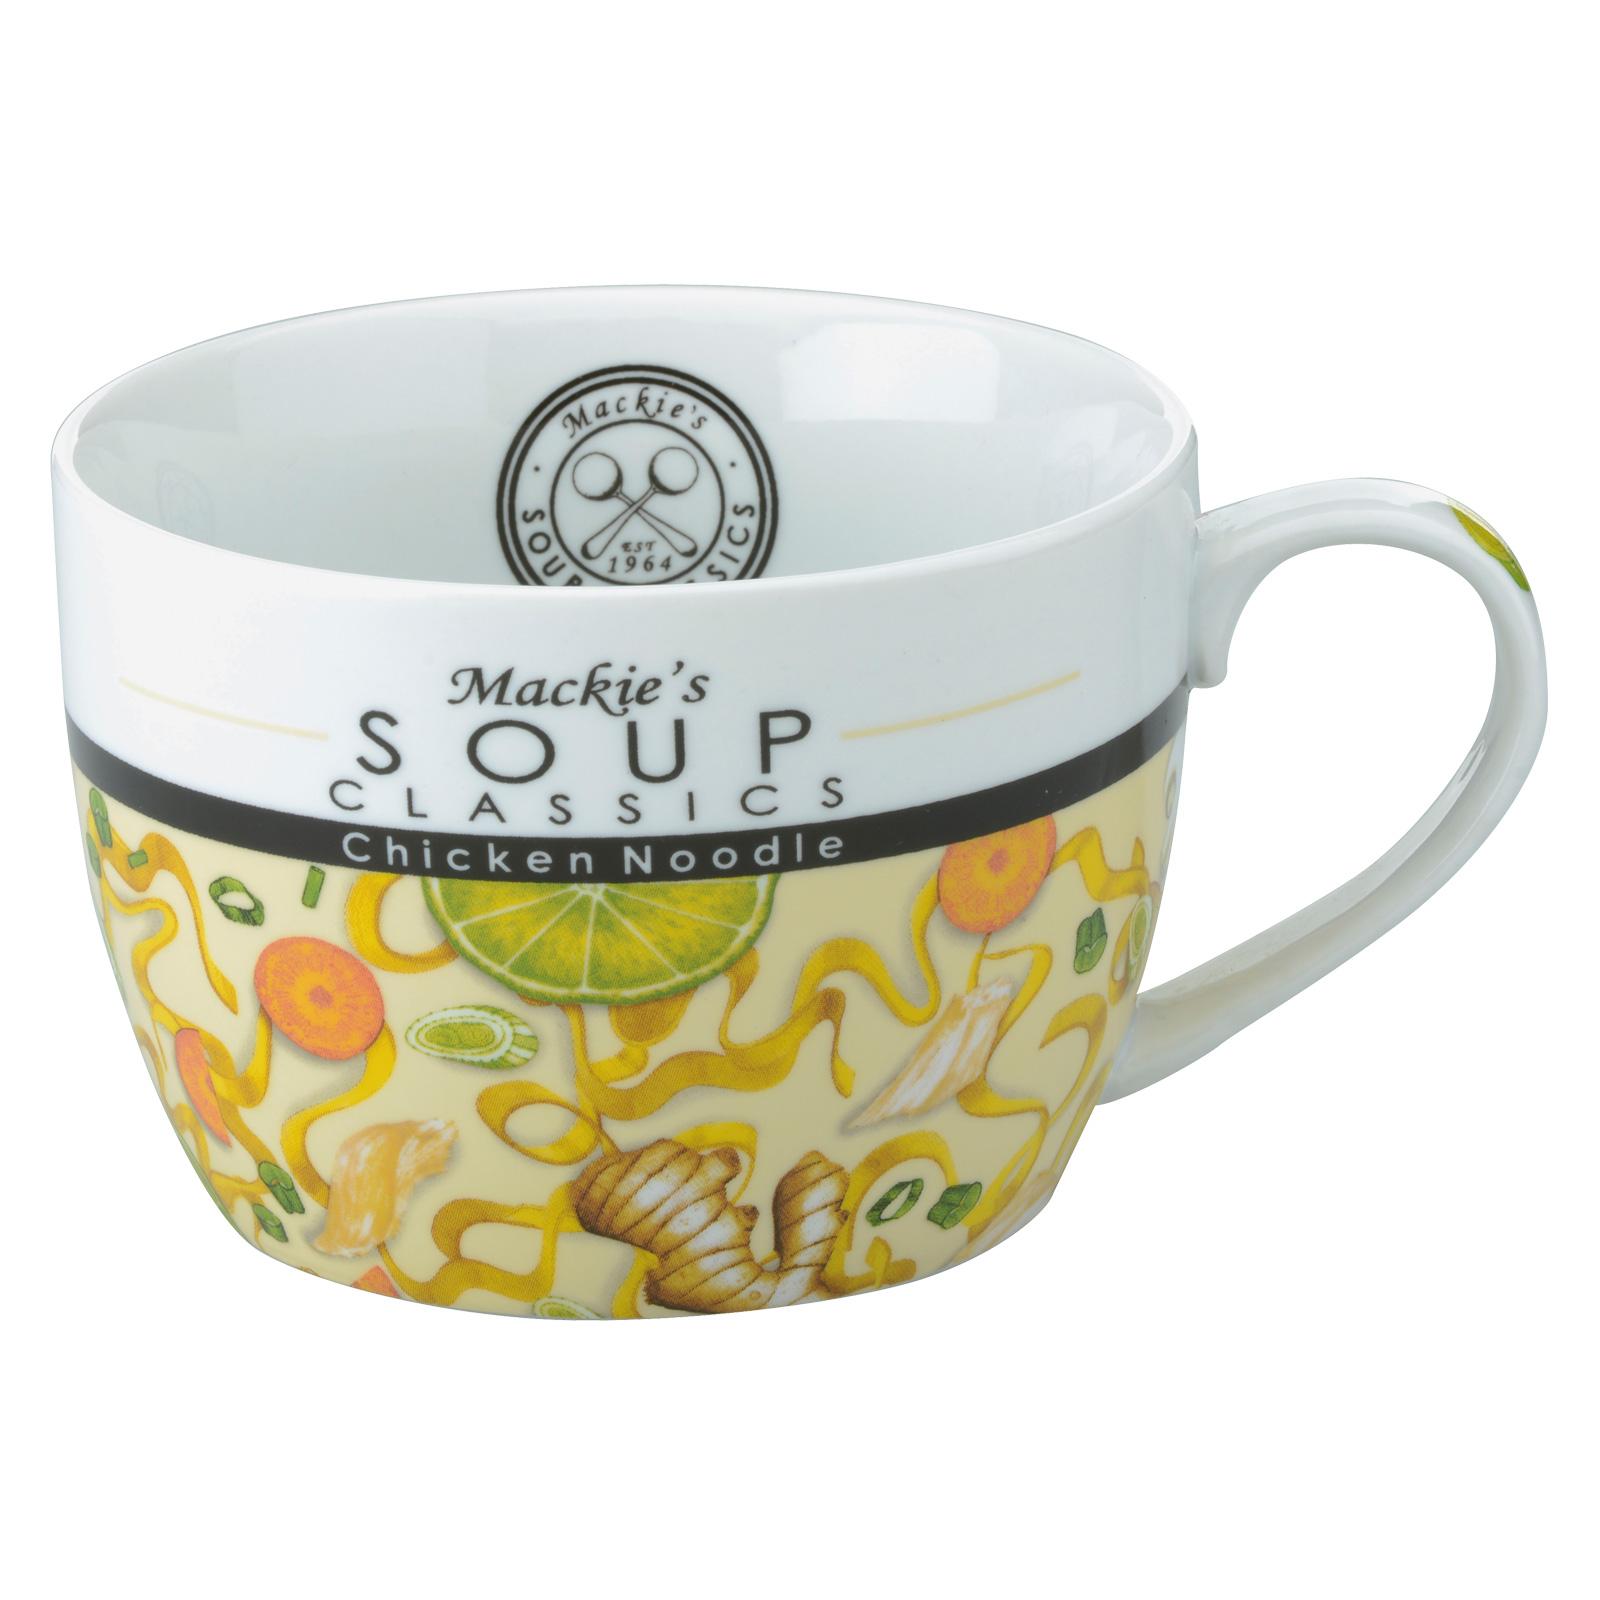 Mackie's Chicken Noodle Soup Mug